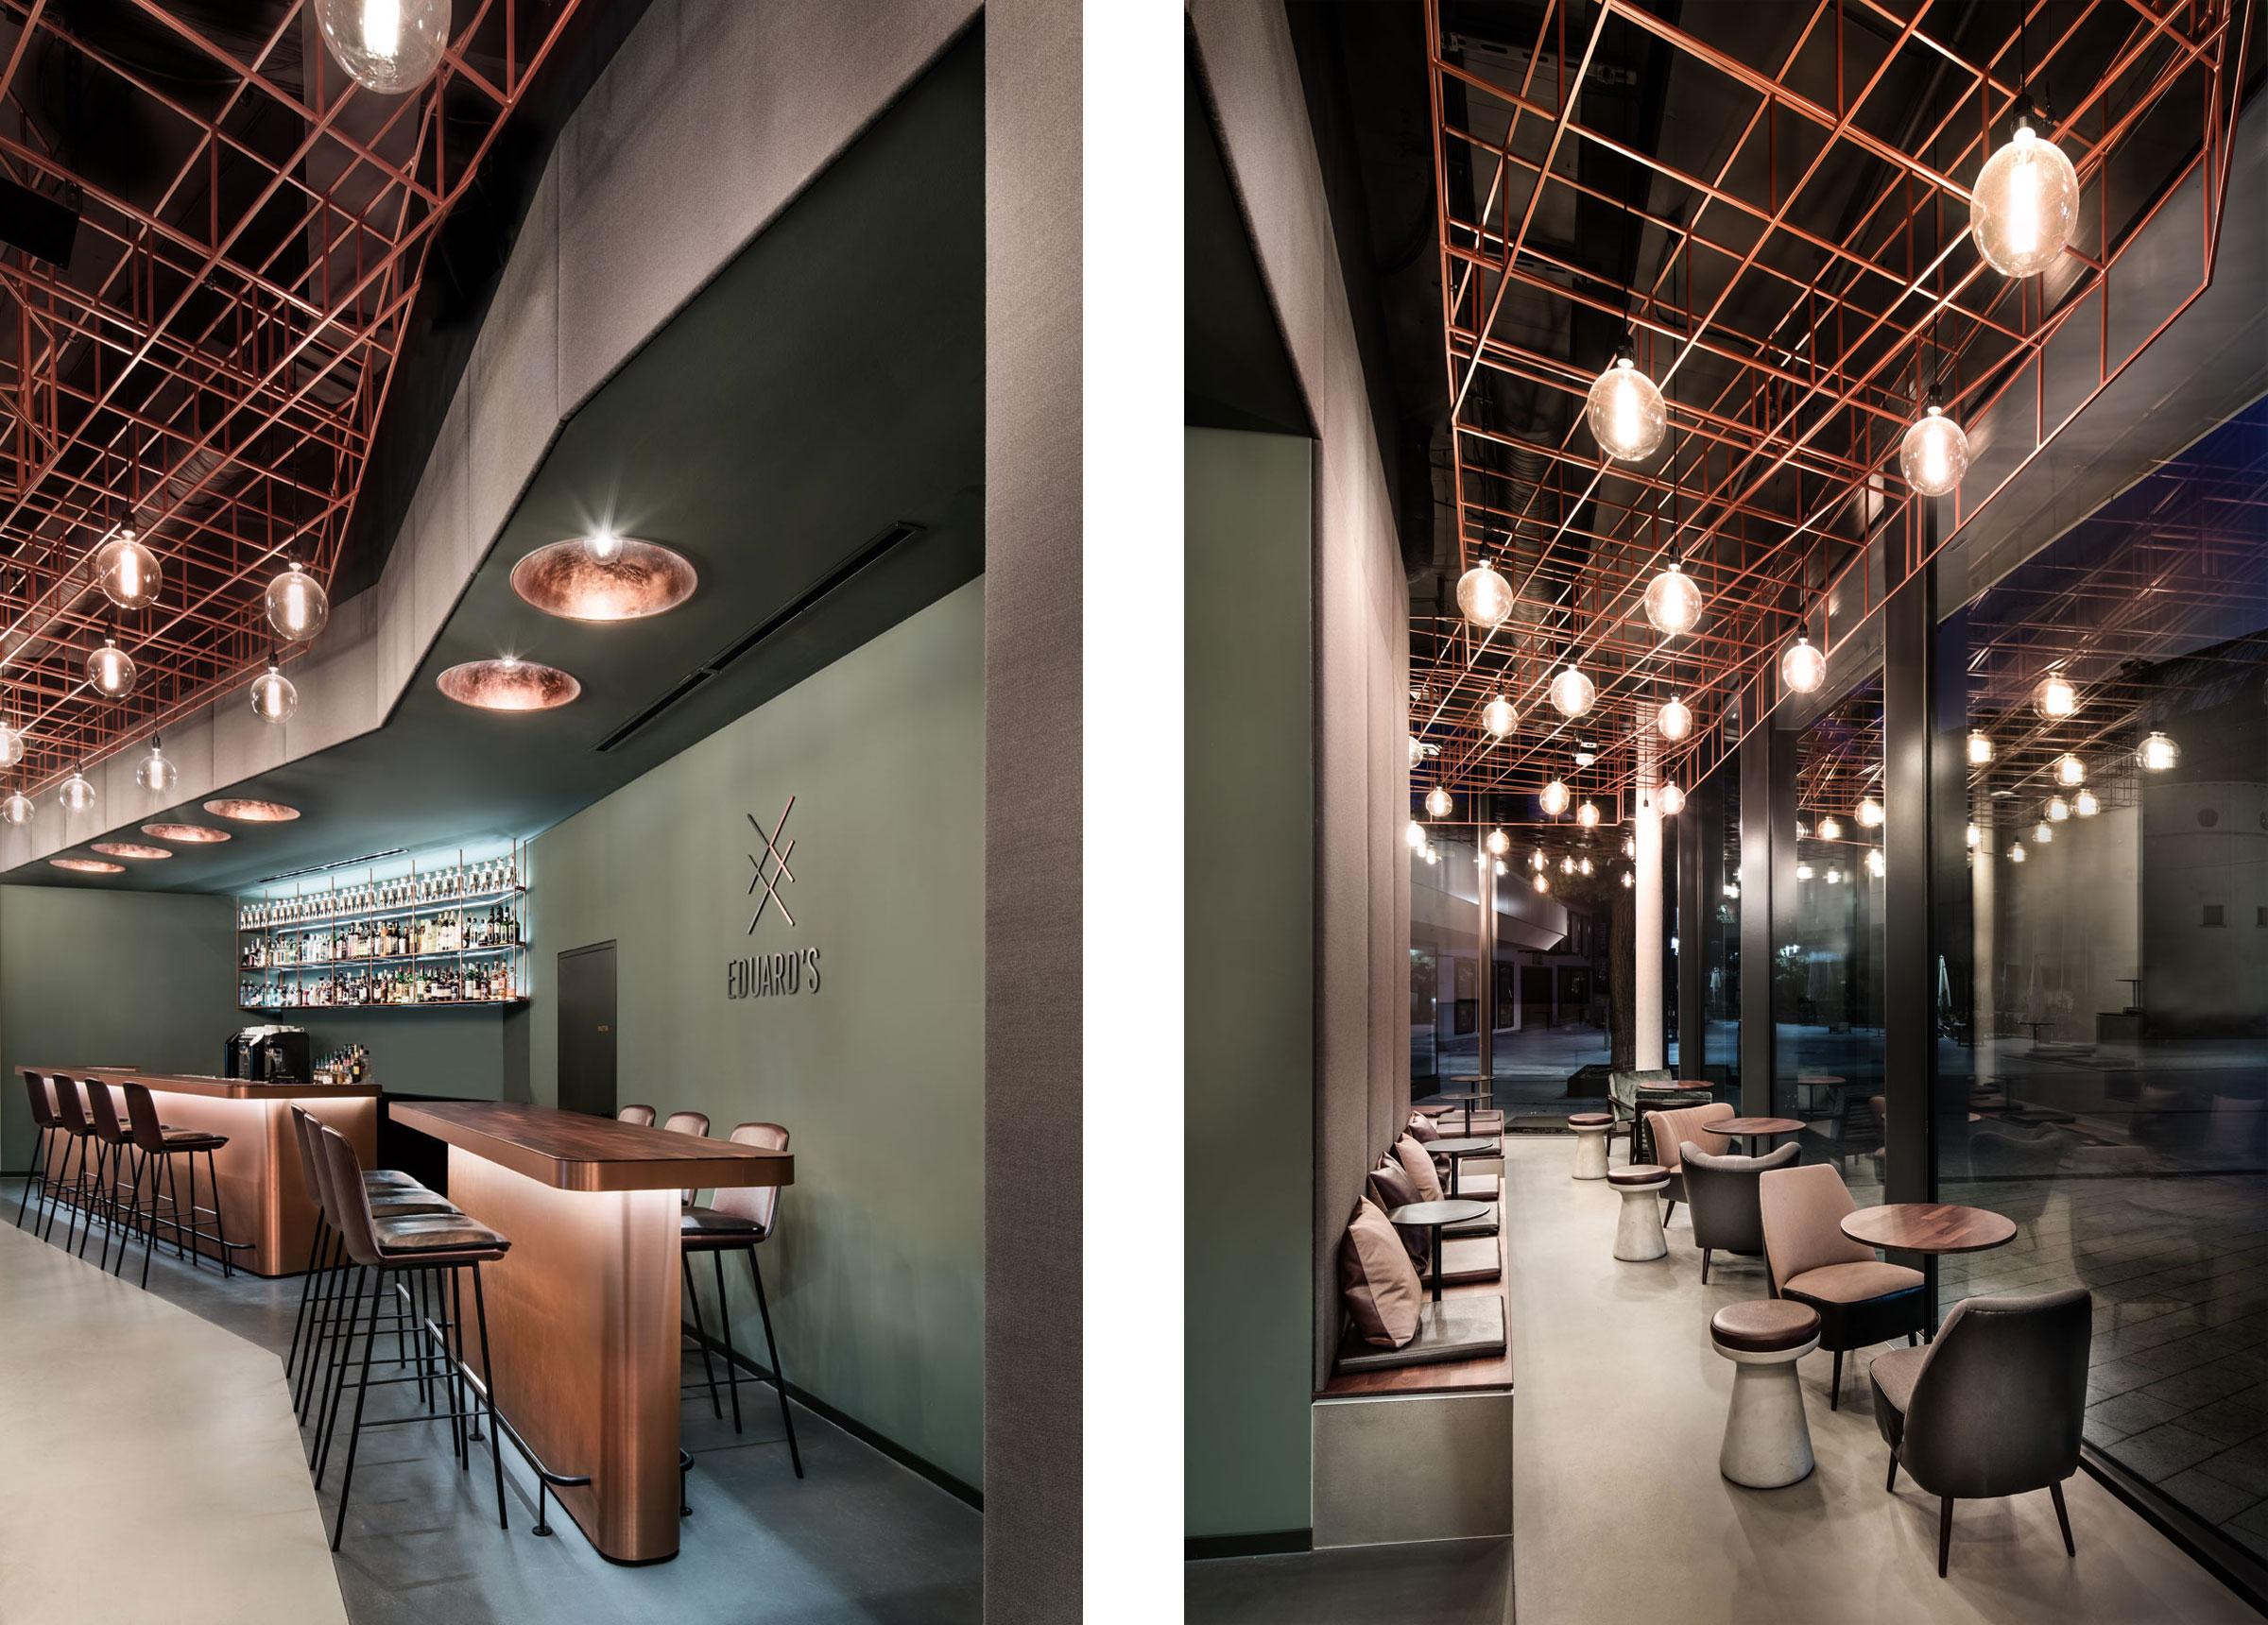 hotel gastronomie dia dittel architekten. Black Bedroom Furniture Sets. Home Design Ideas